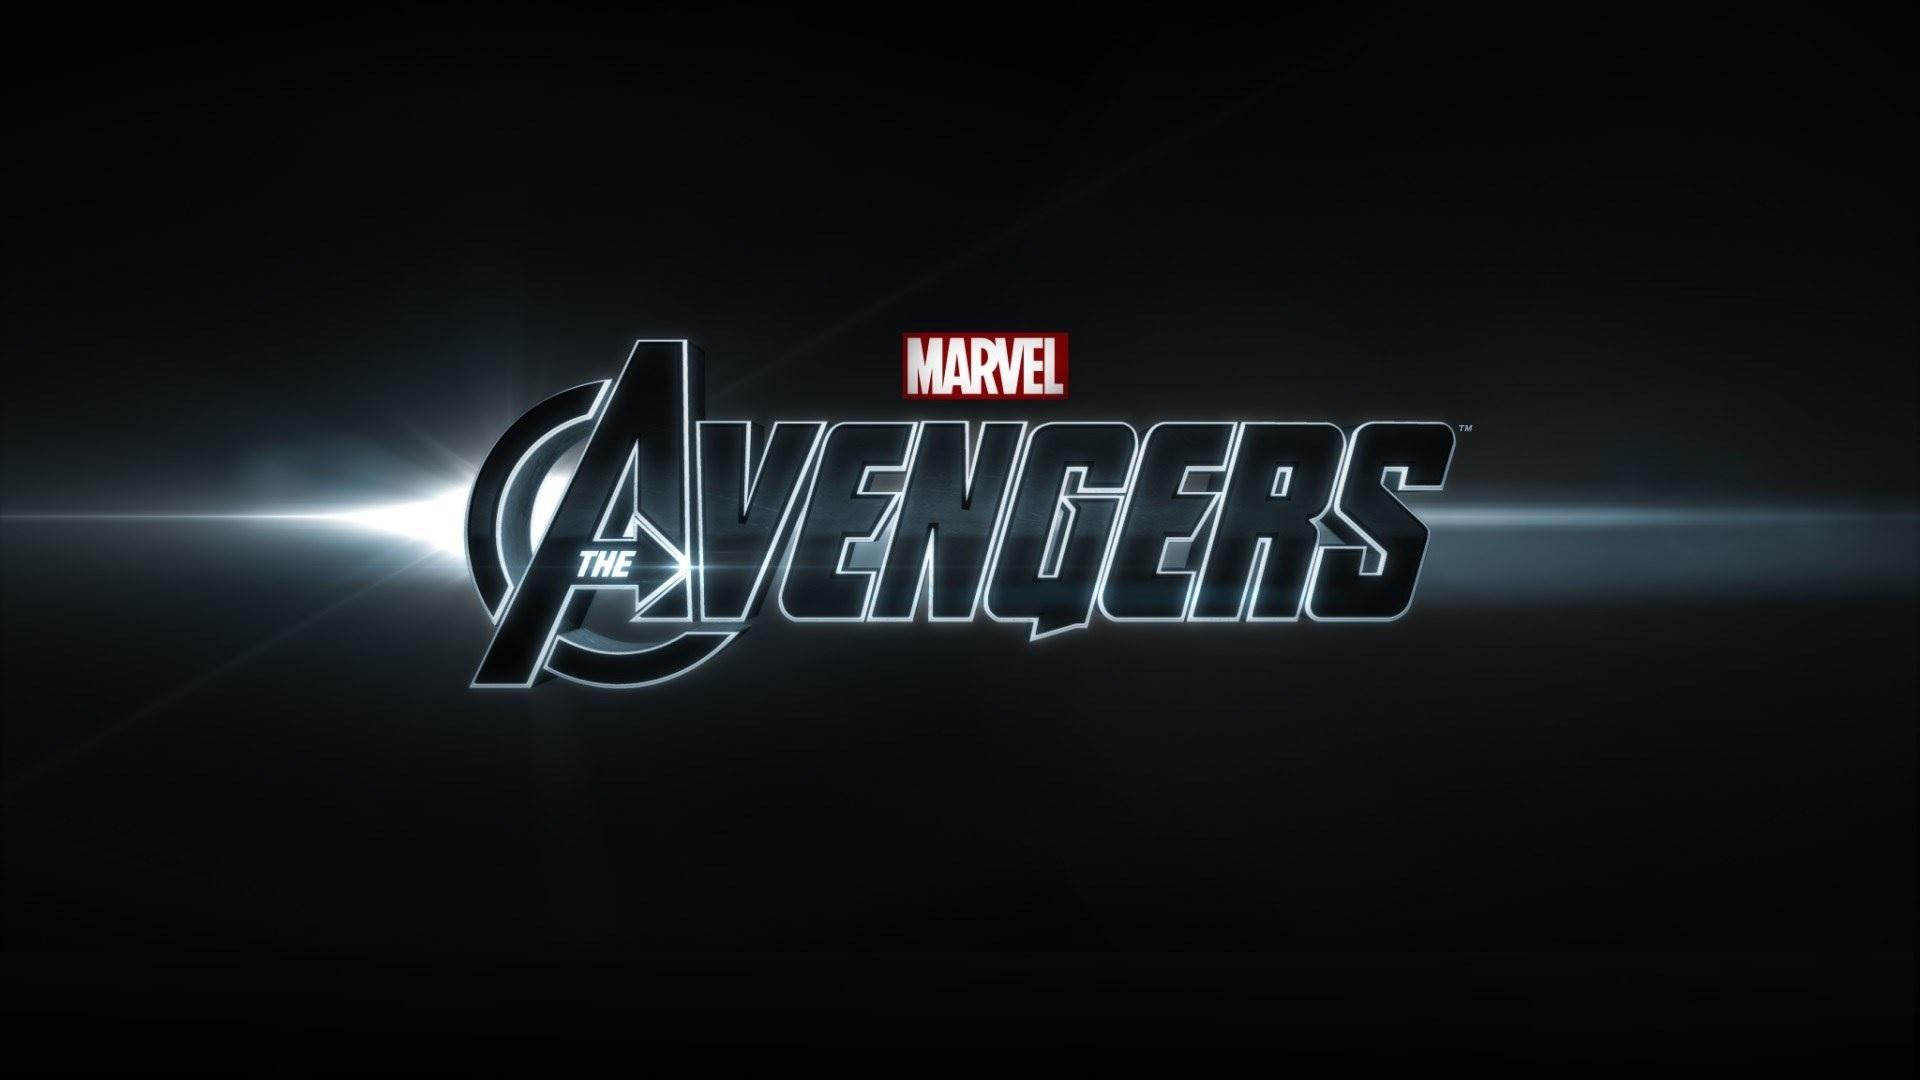 Los Vengadores (The Avengers), Filmes del 2012 y 2015 – Soundtrack, Tráiler